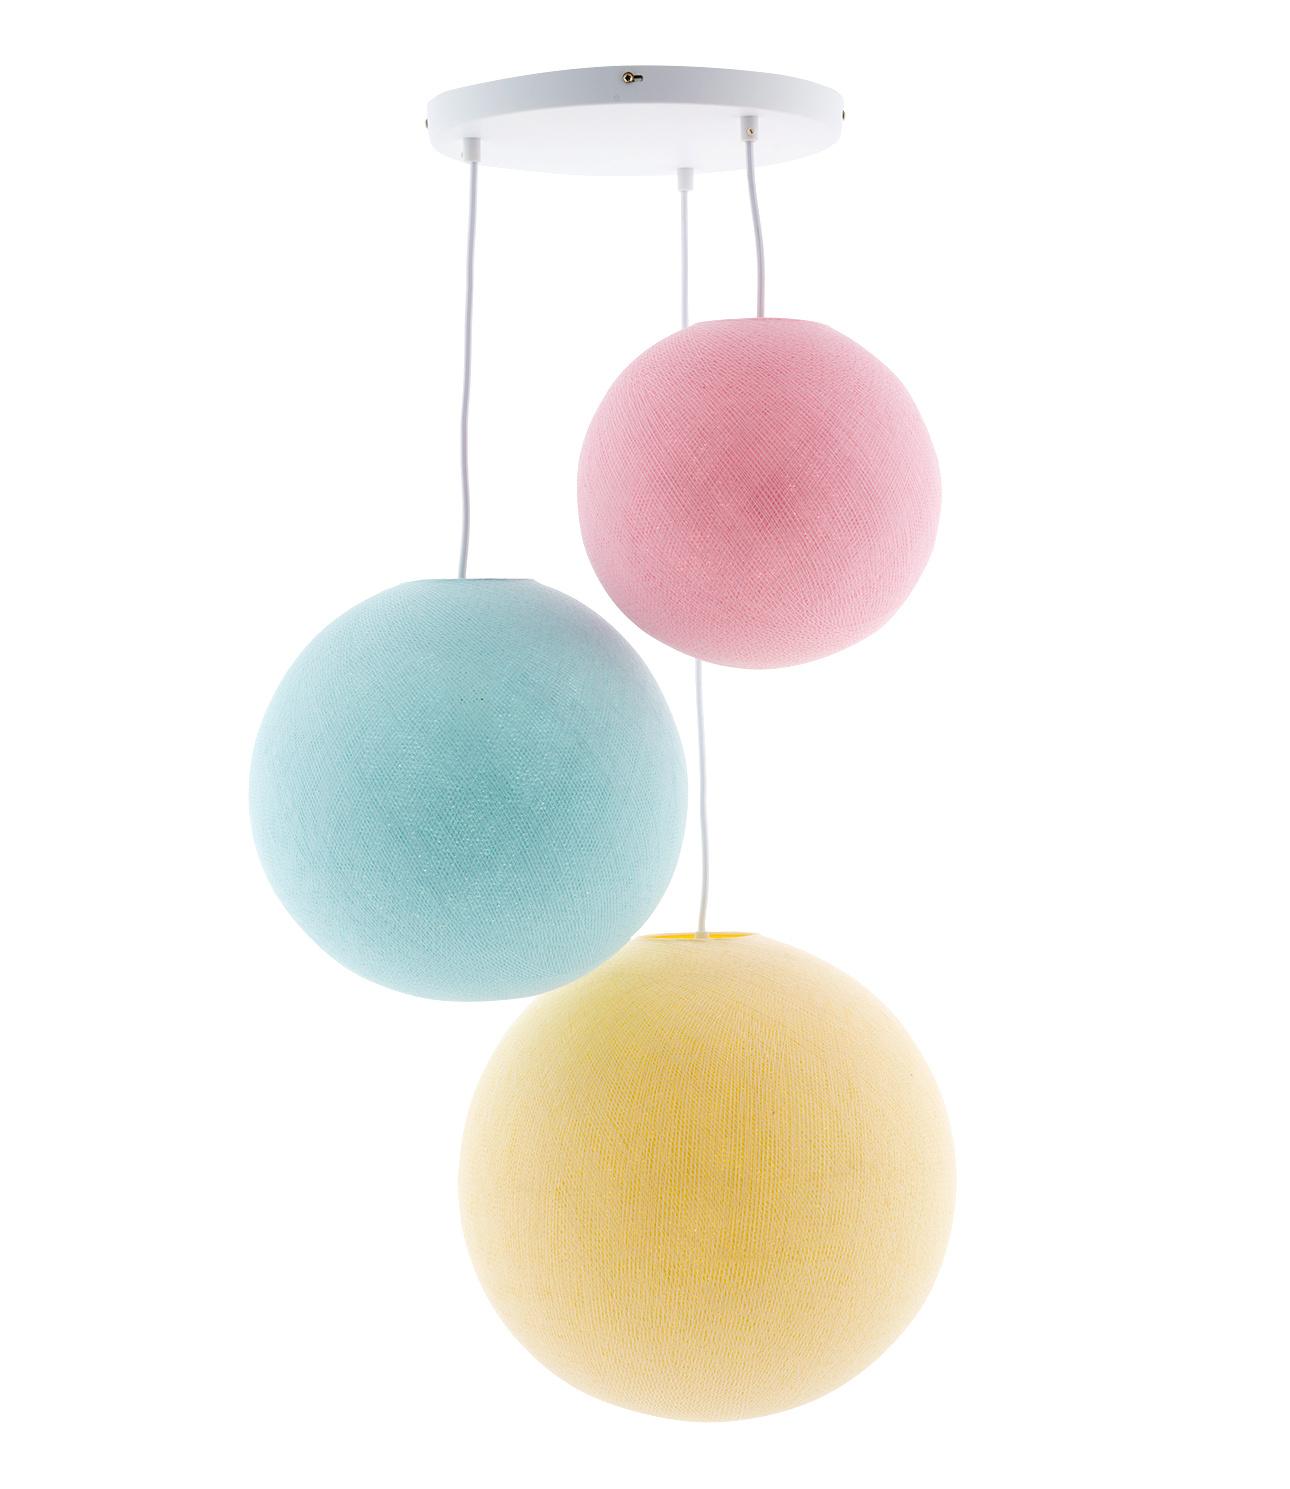 Drievoudige hanglamp 3 punt - Pastel